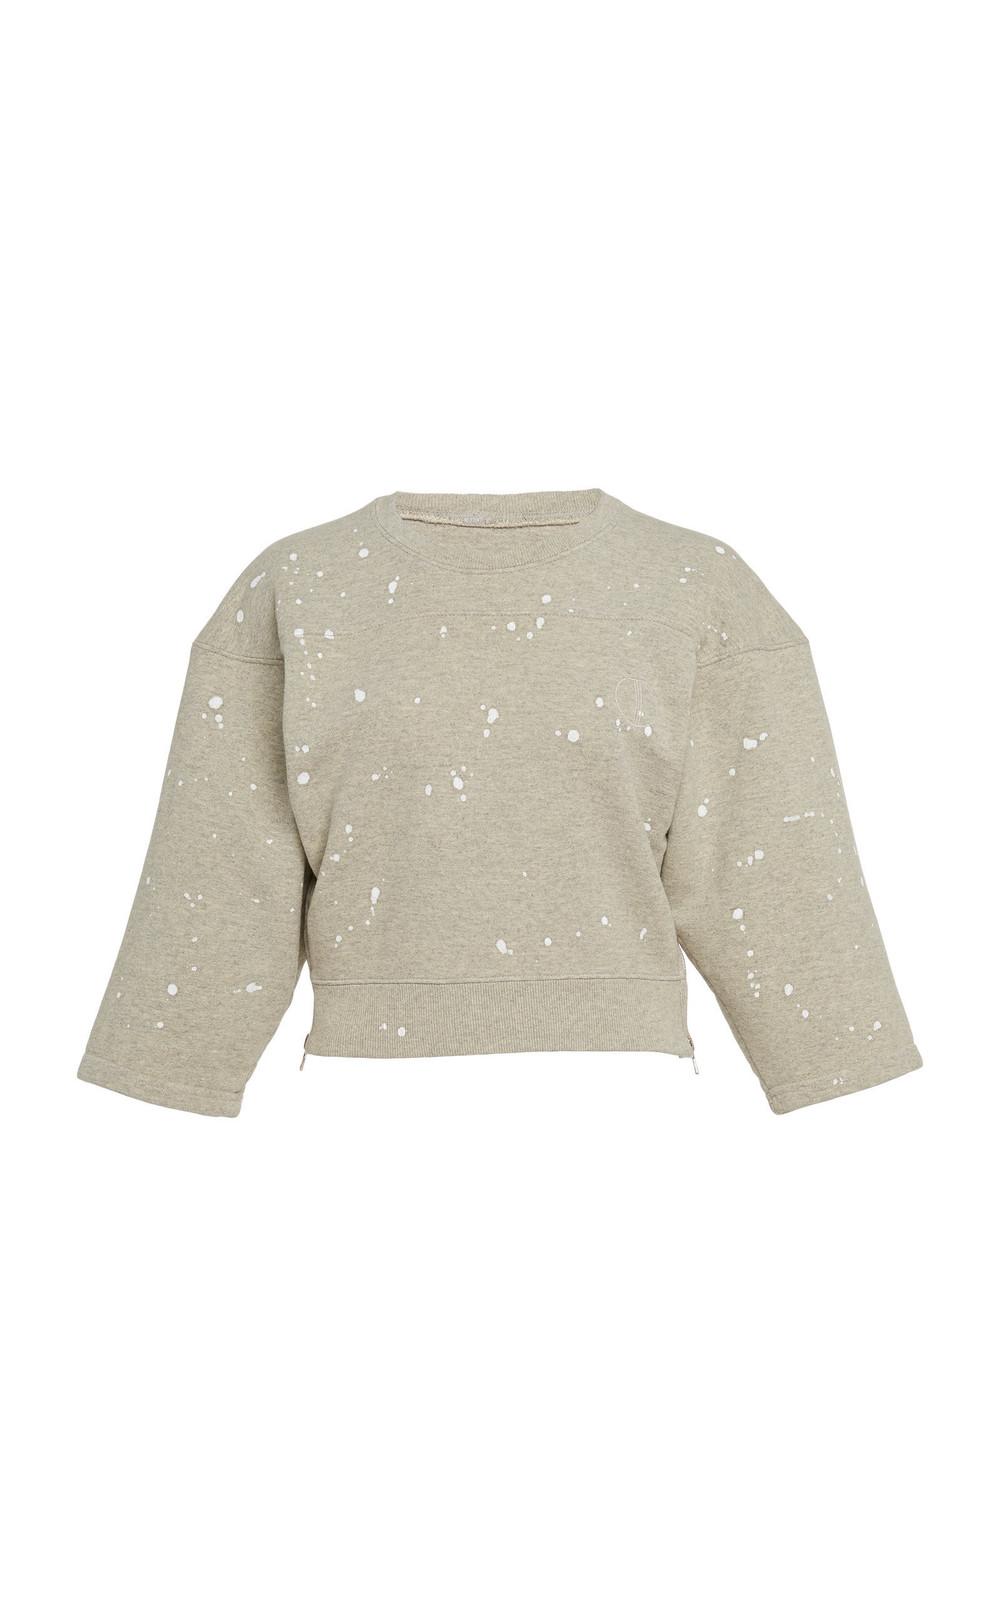 Tre by Natalie Ratabesi Cotton Tiagra Cropped Sweatshirt in grey